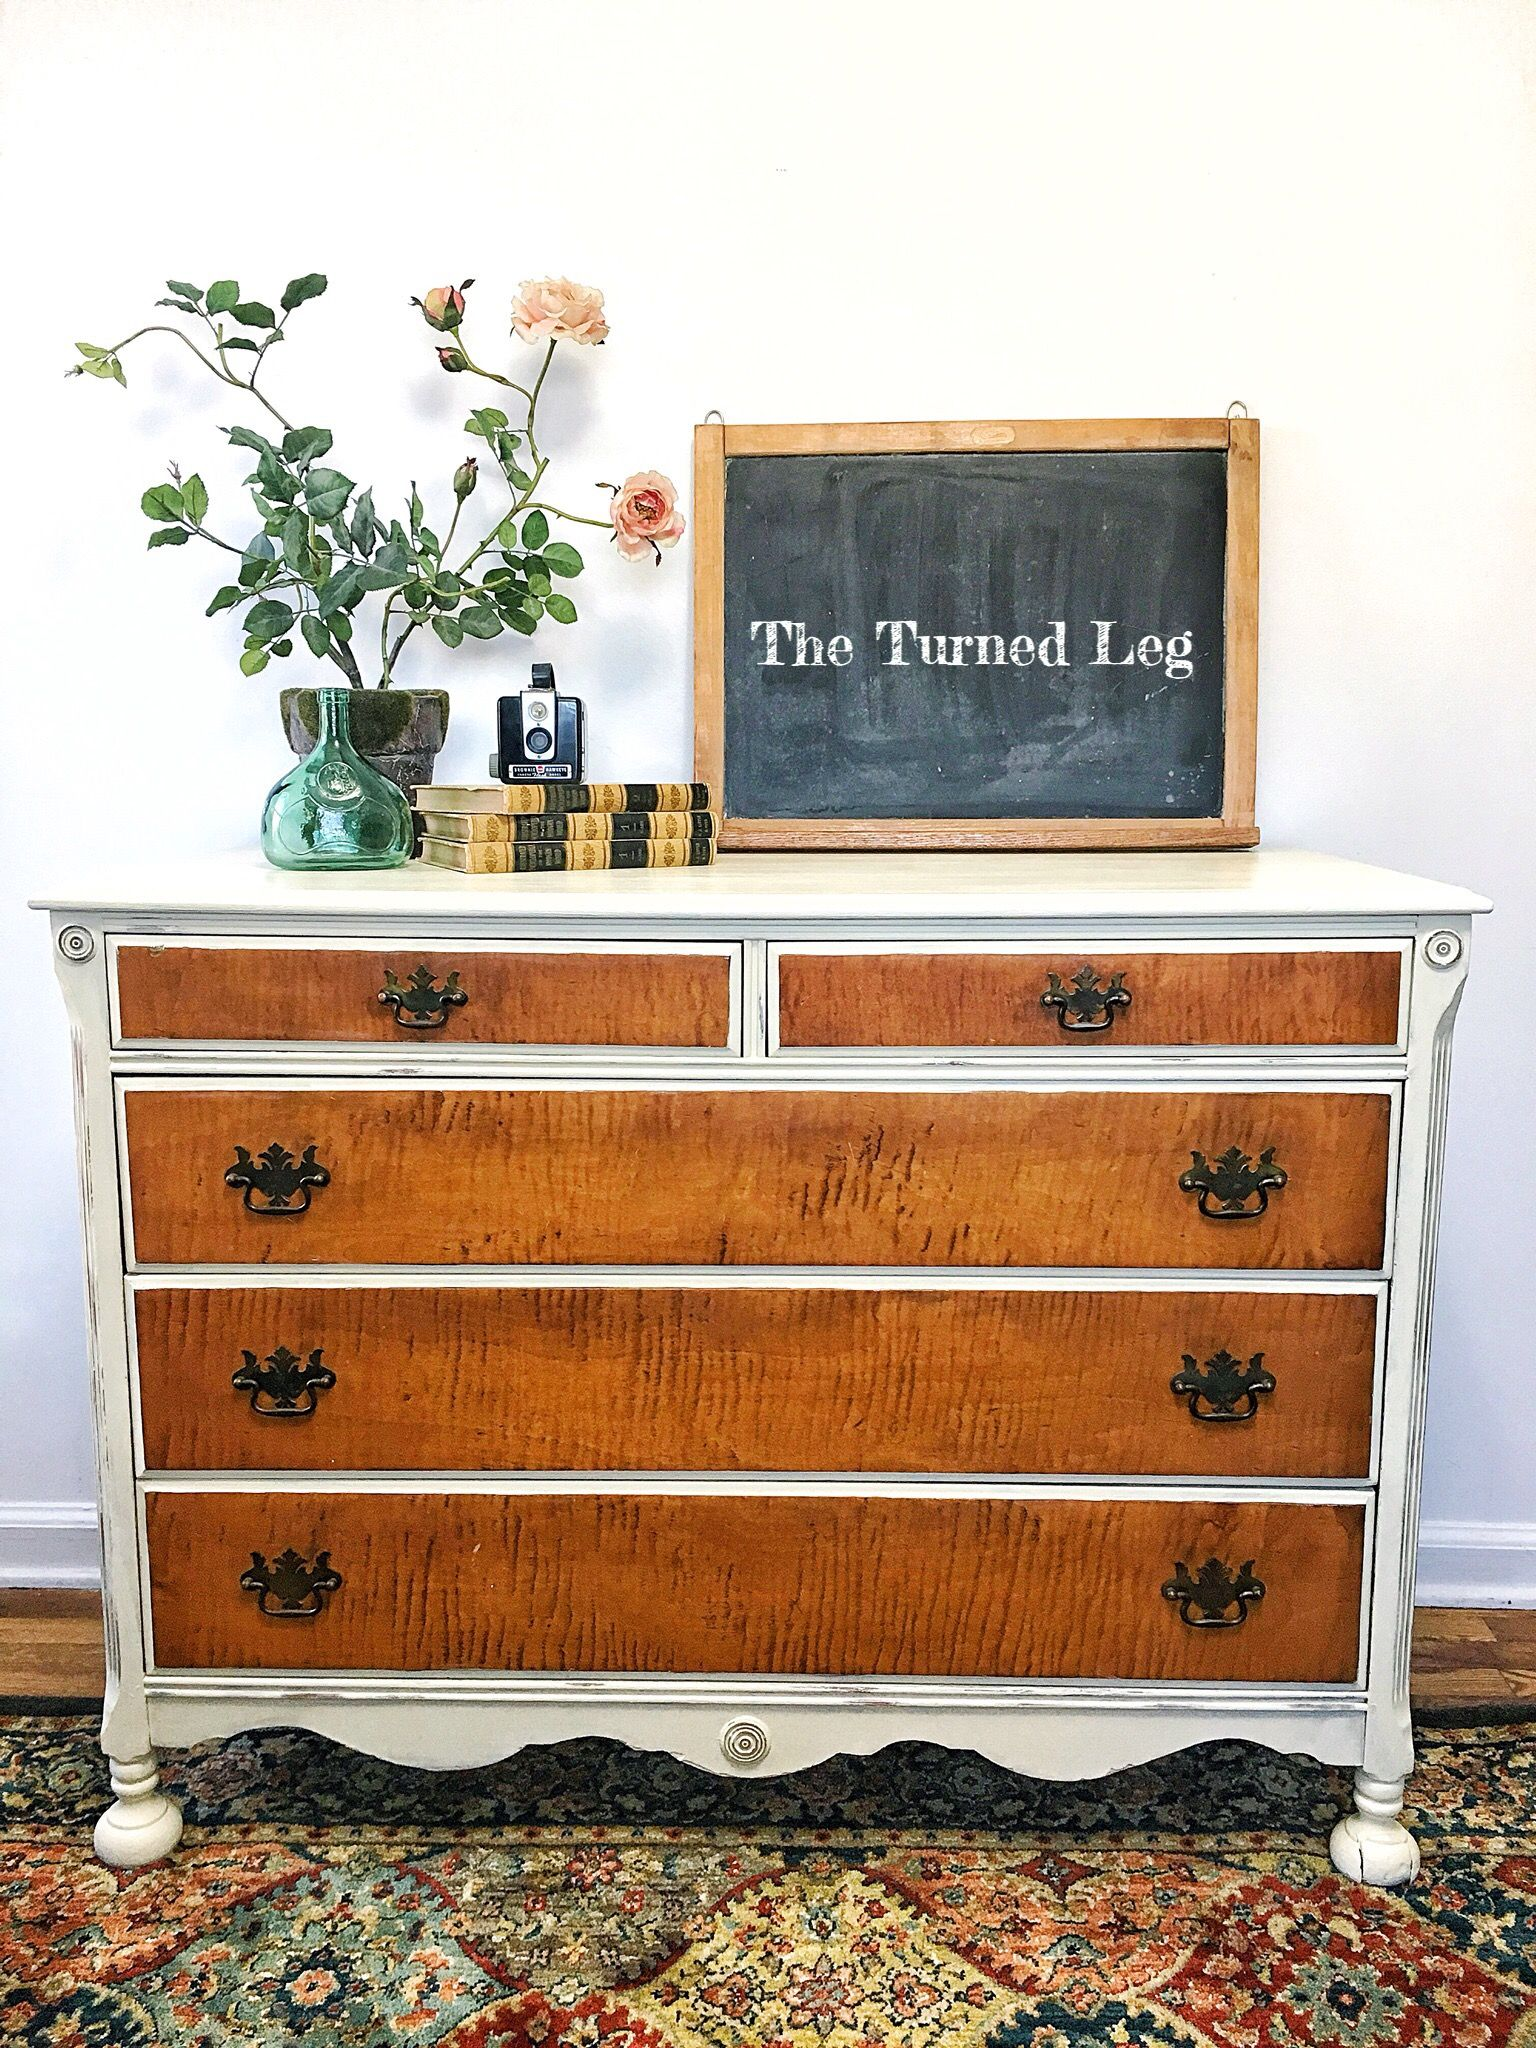 Crinoline Burled Wood Dresser 159 95 The Turned Leg The Turned Leg The Turned Leg Sells Hand Pa Repurposed Furniture Furniture Painting Wooden Furniture